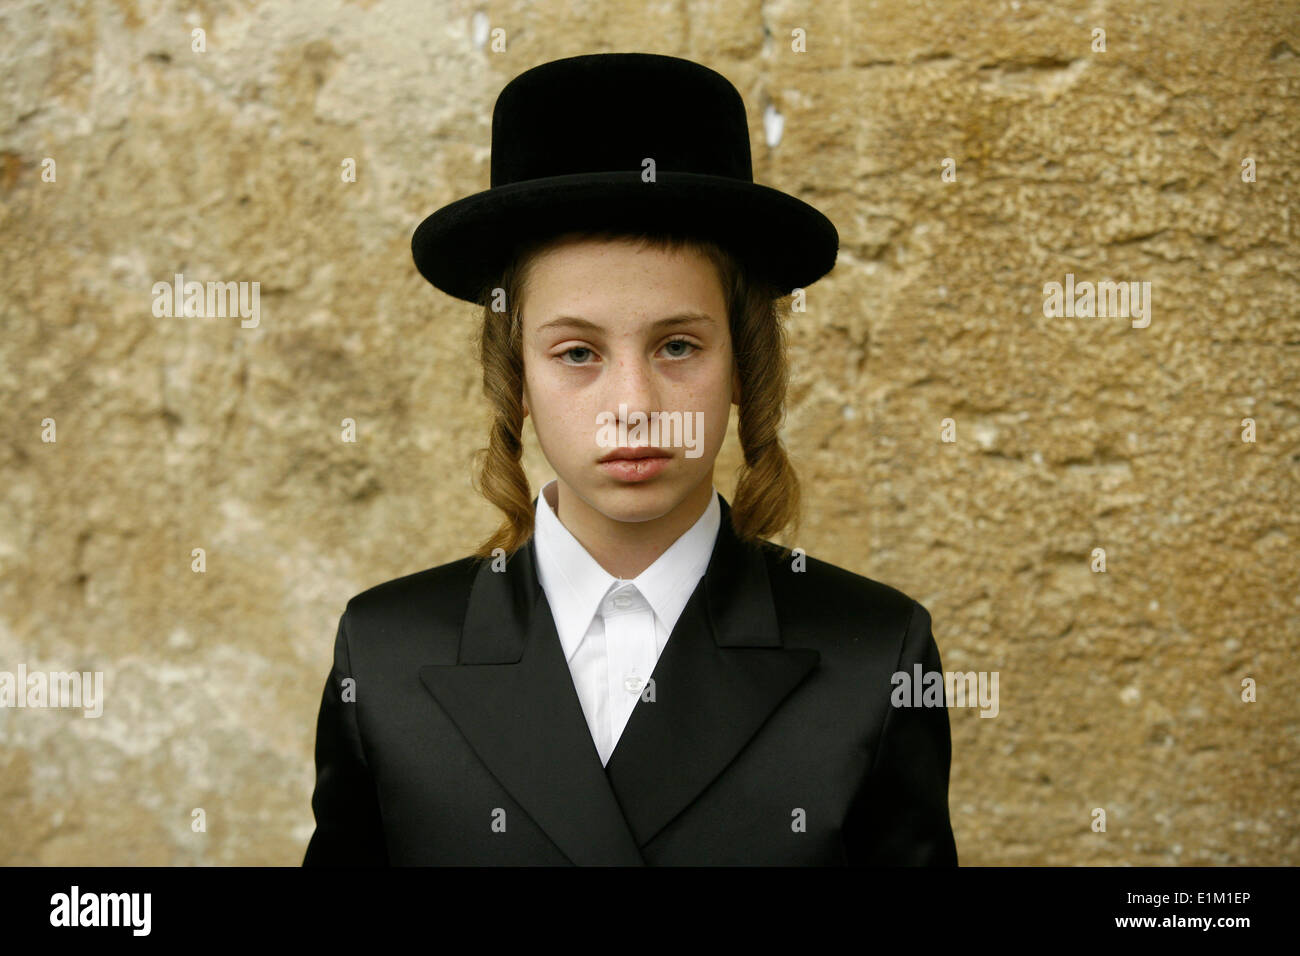 Jewish boy images 84